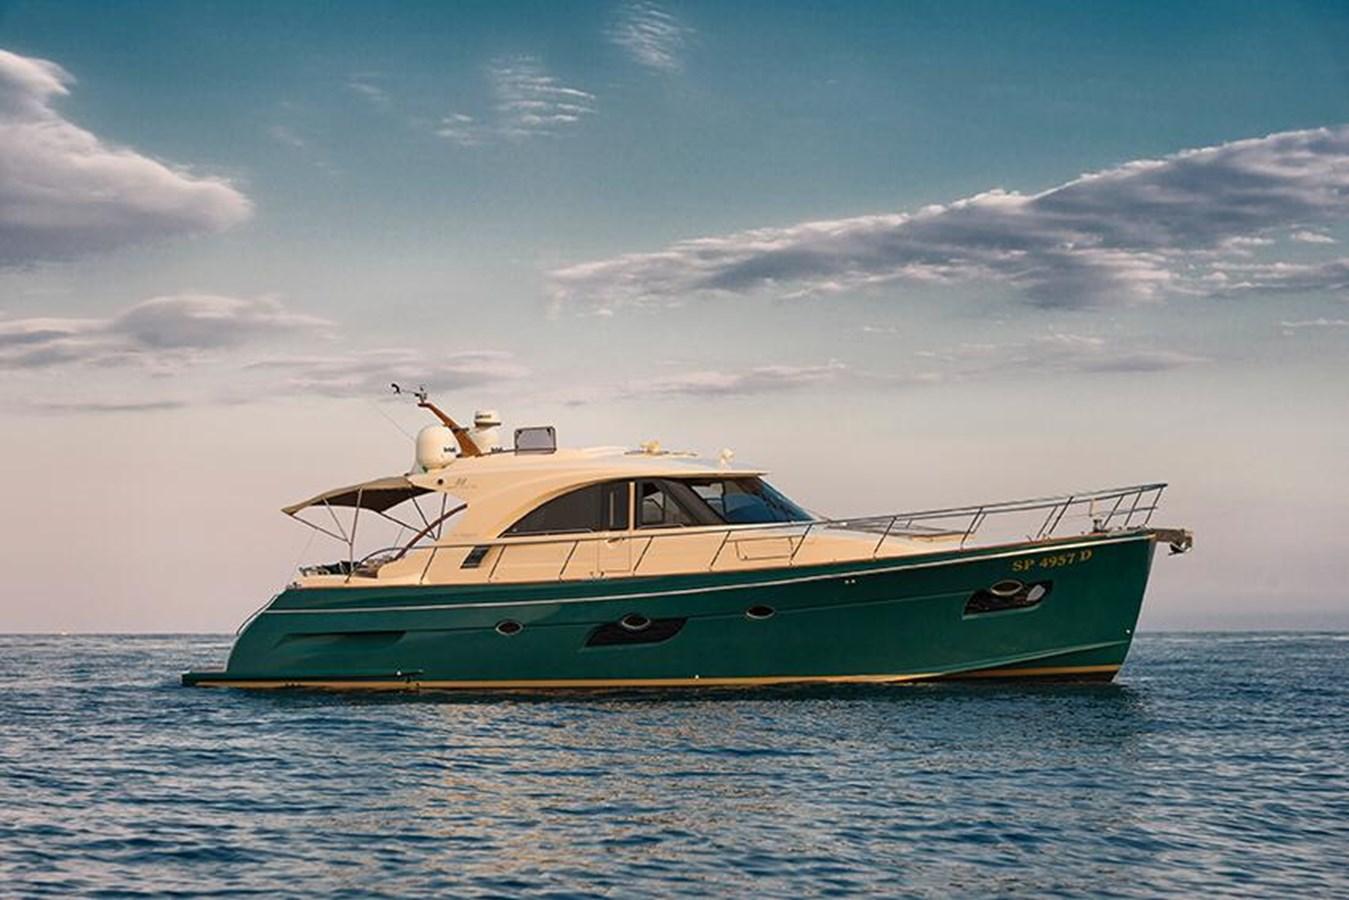 IMG-20200304-WA0017 2011 ABATI YACHTS kEYPORT 60 Motor Yacht 2879777